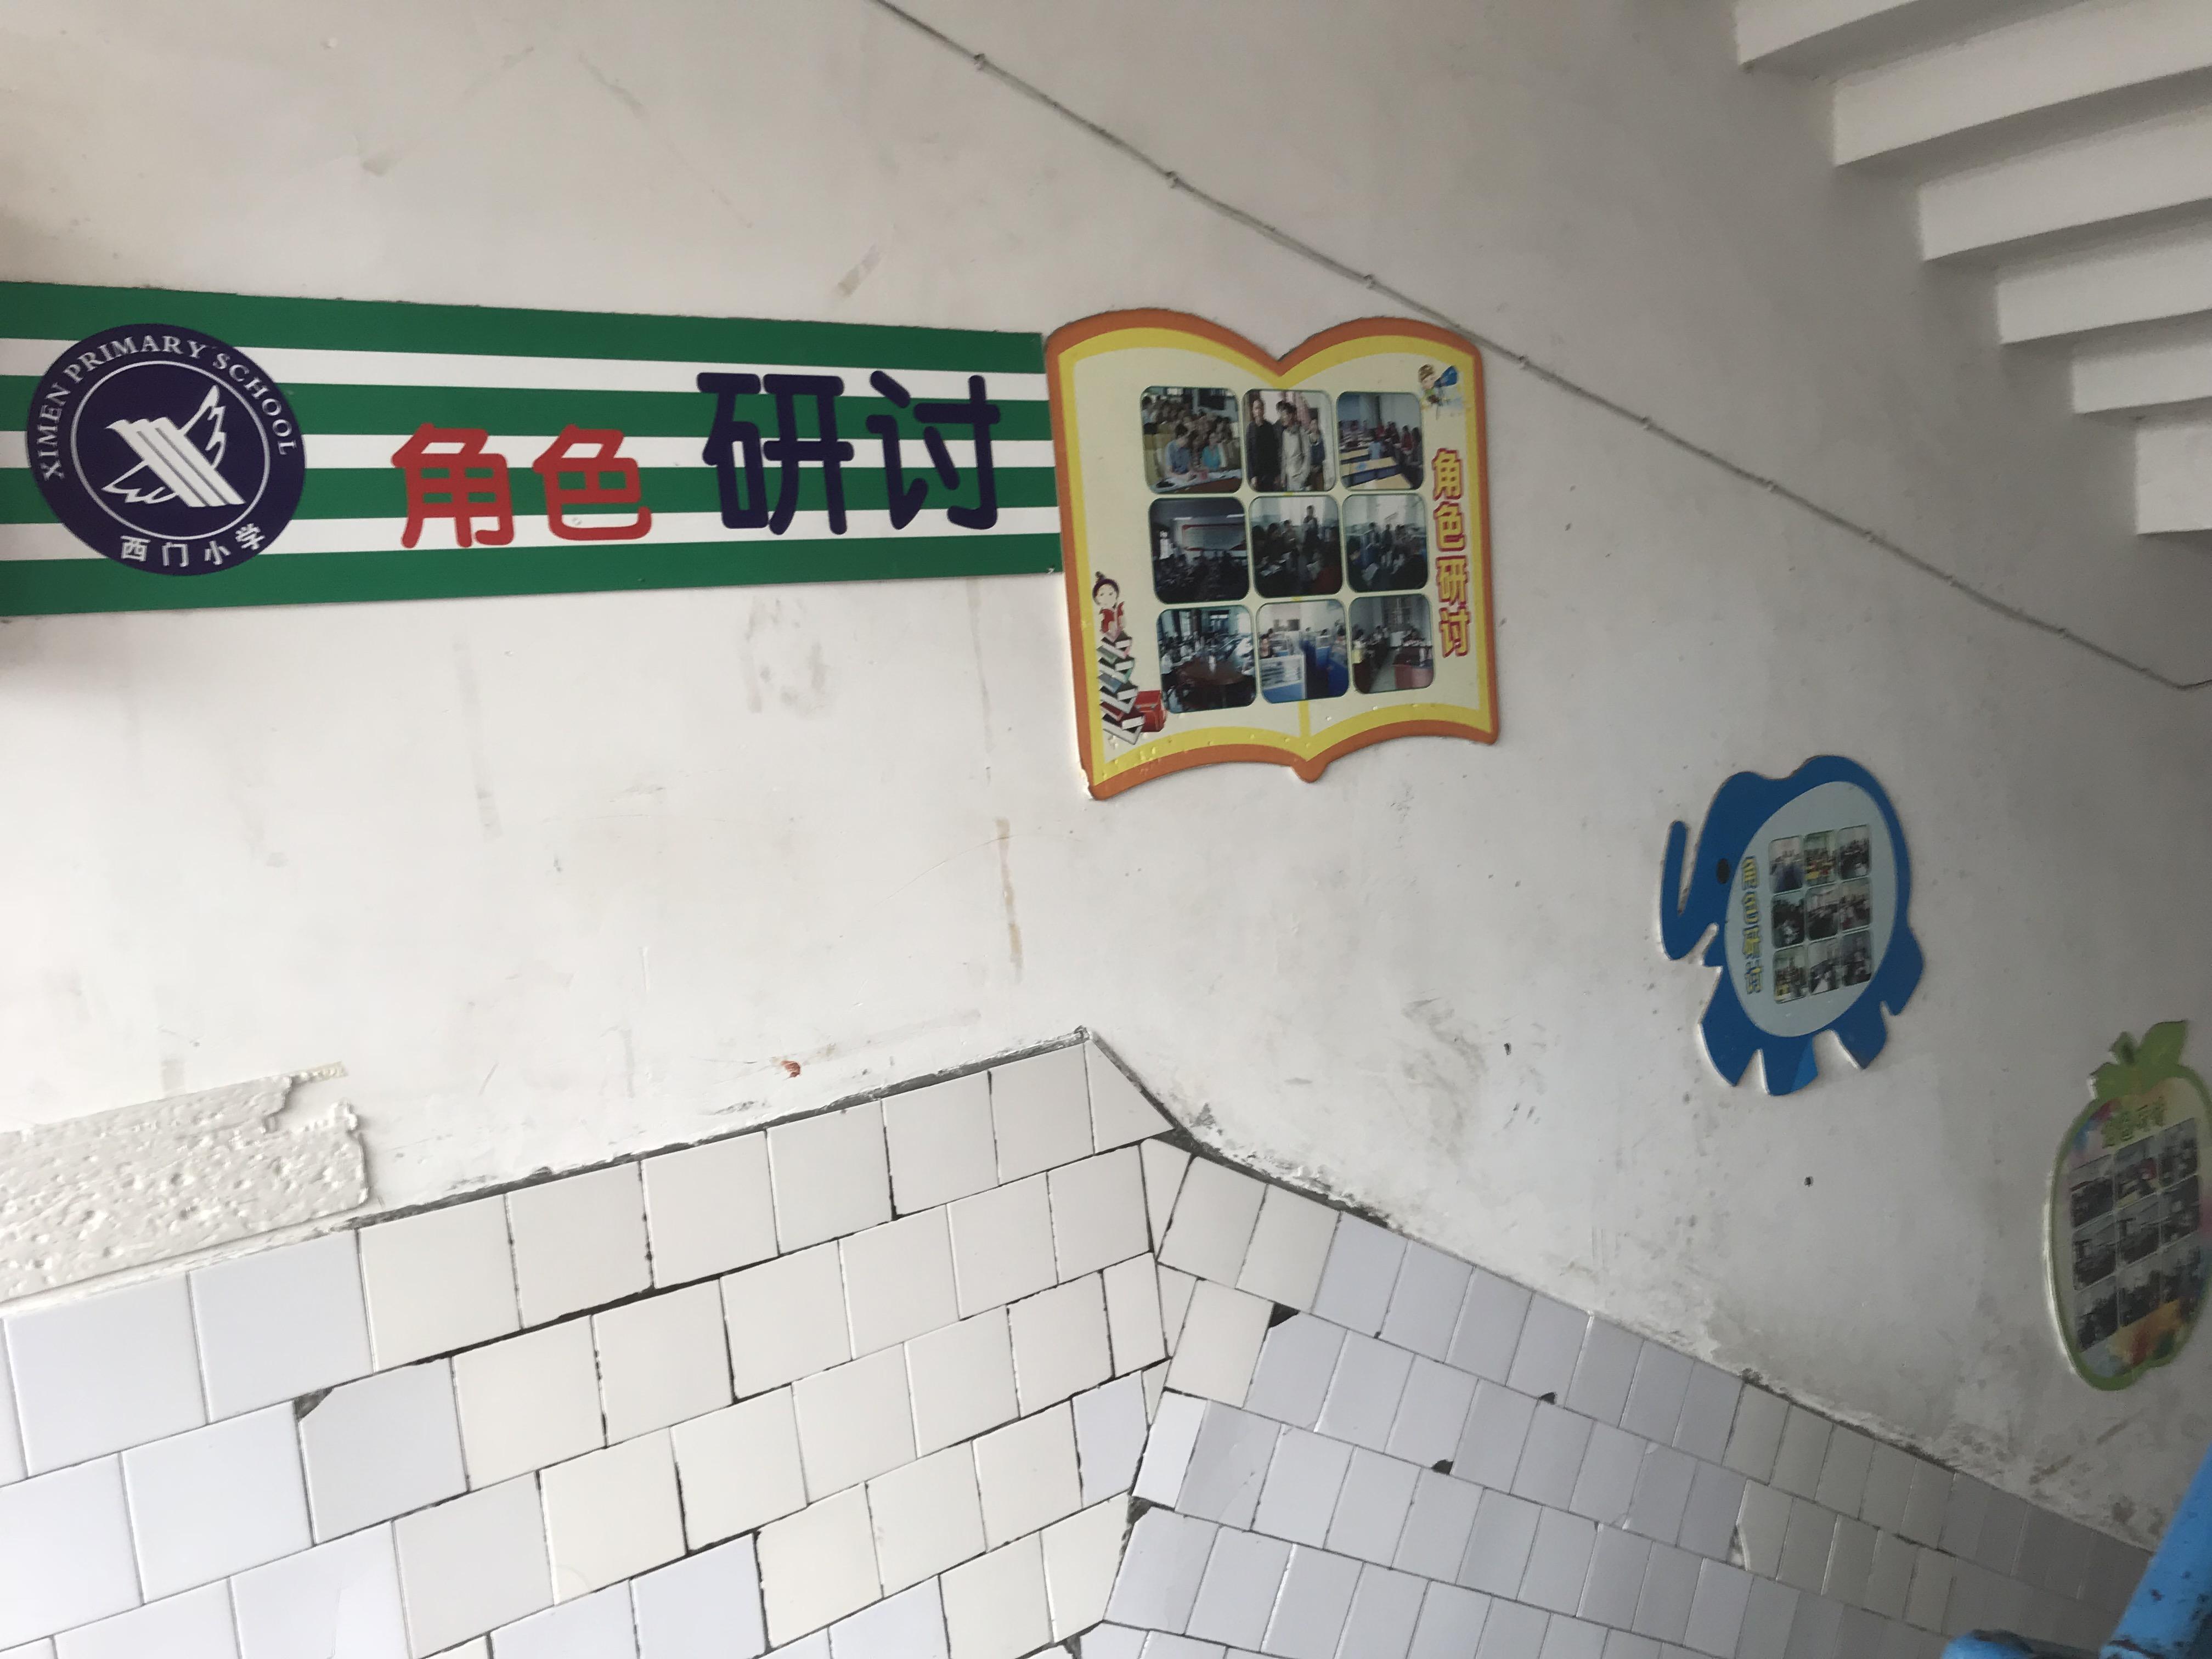 m6电竞市第二小学校园文化建设(图43)